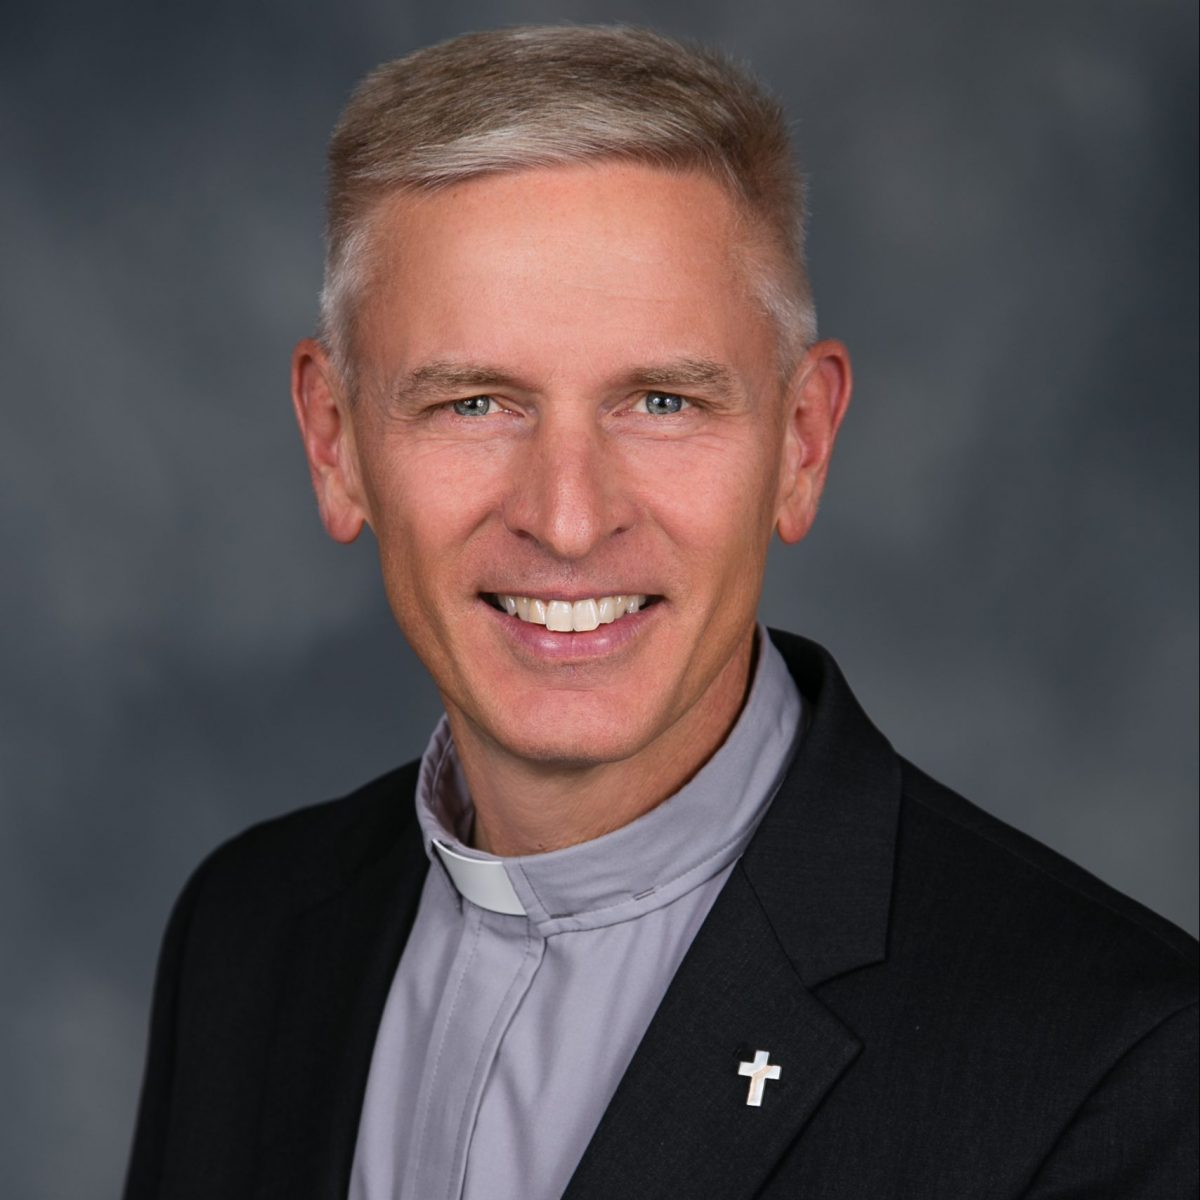 Deacon Robert Seydel